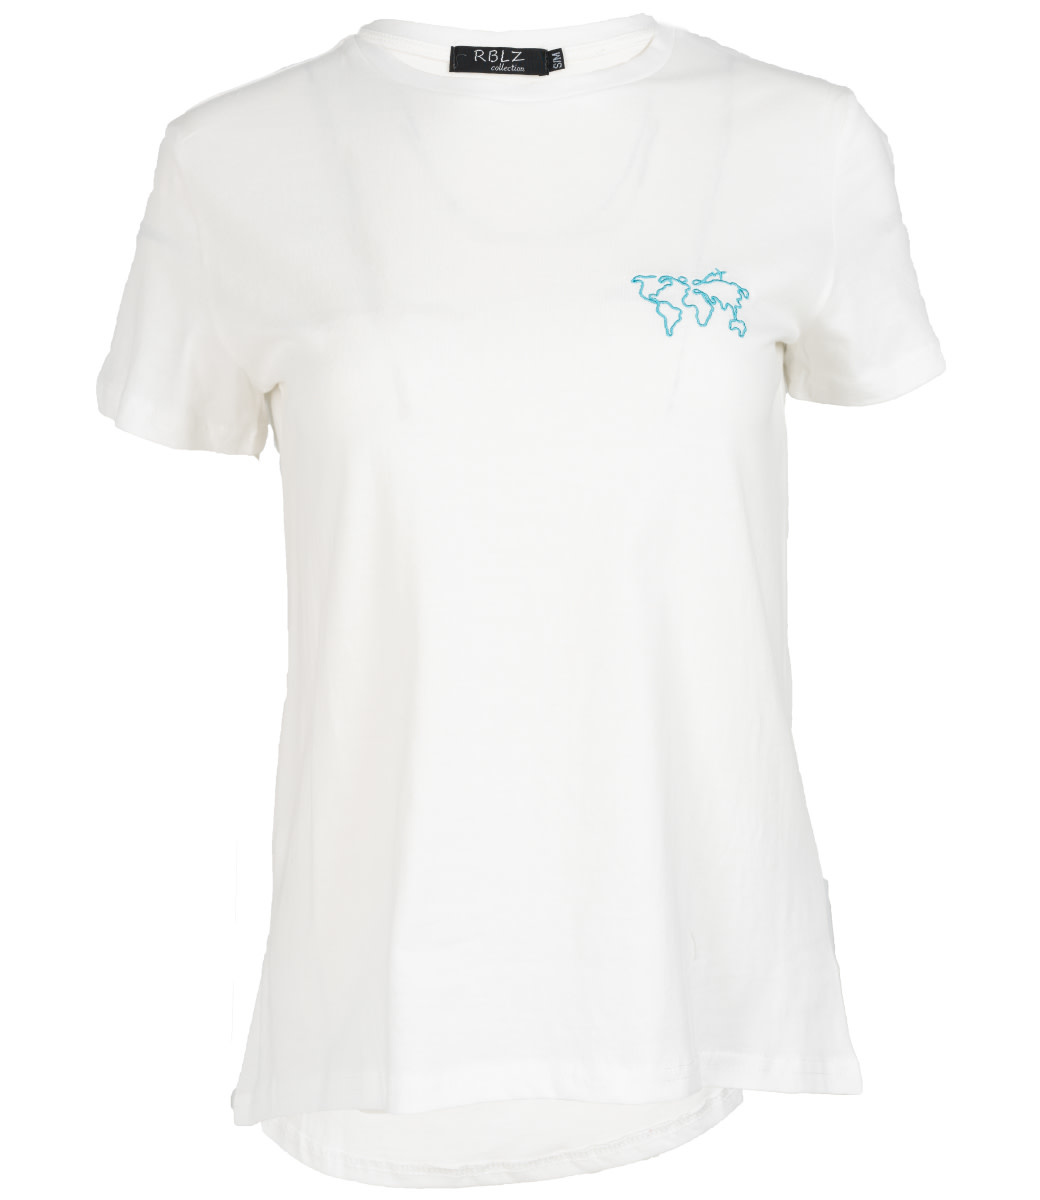 Rebelz Collection Shirt wit/blauw world